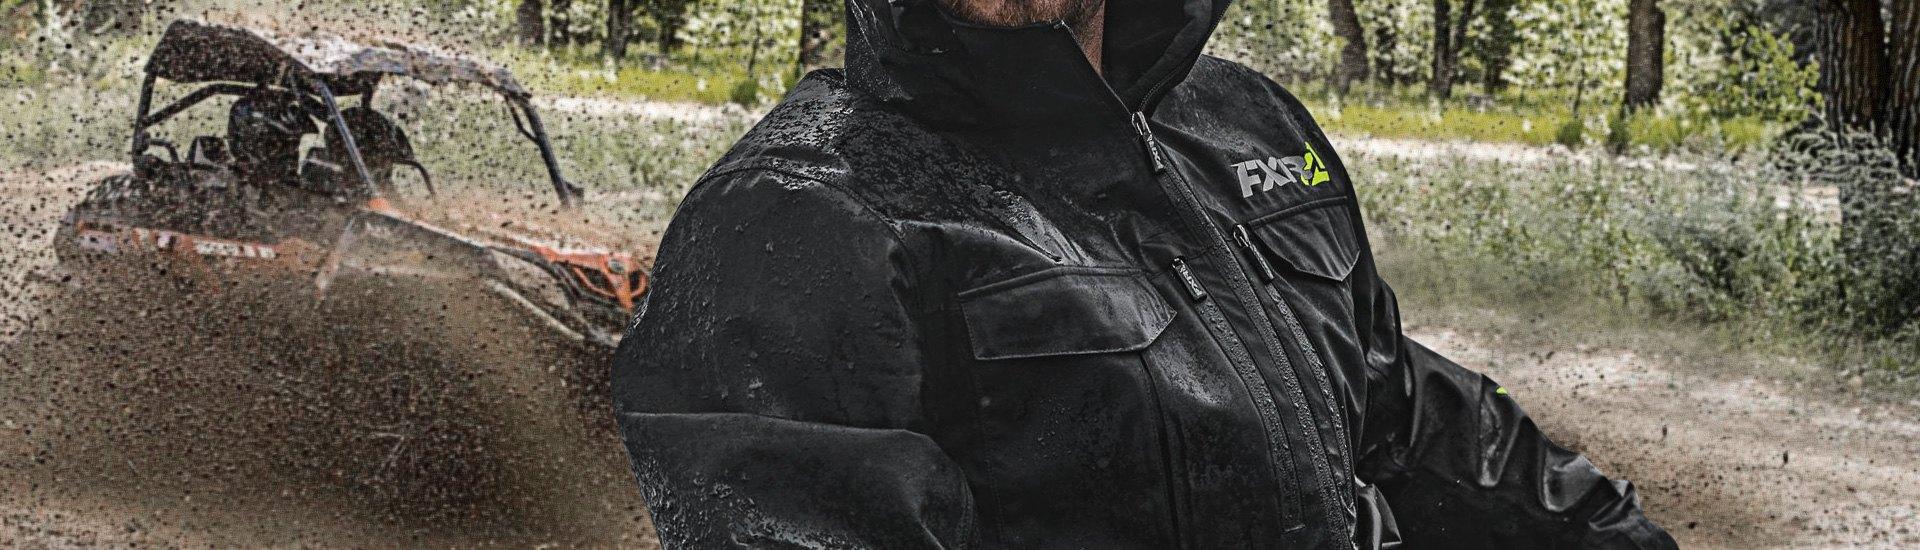 851187673 Powersports Rain Gear | ATV, UTV, Snowmobile - POWERSPORTSiD.com